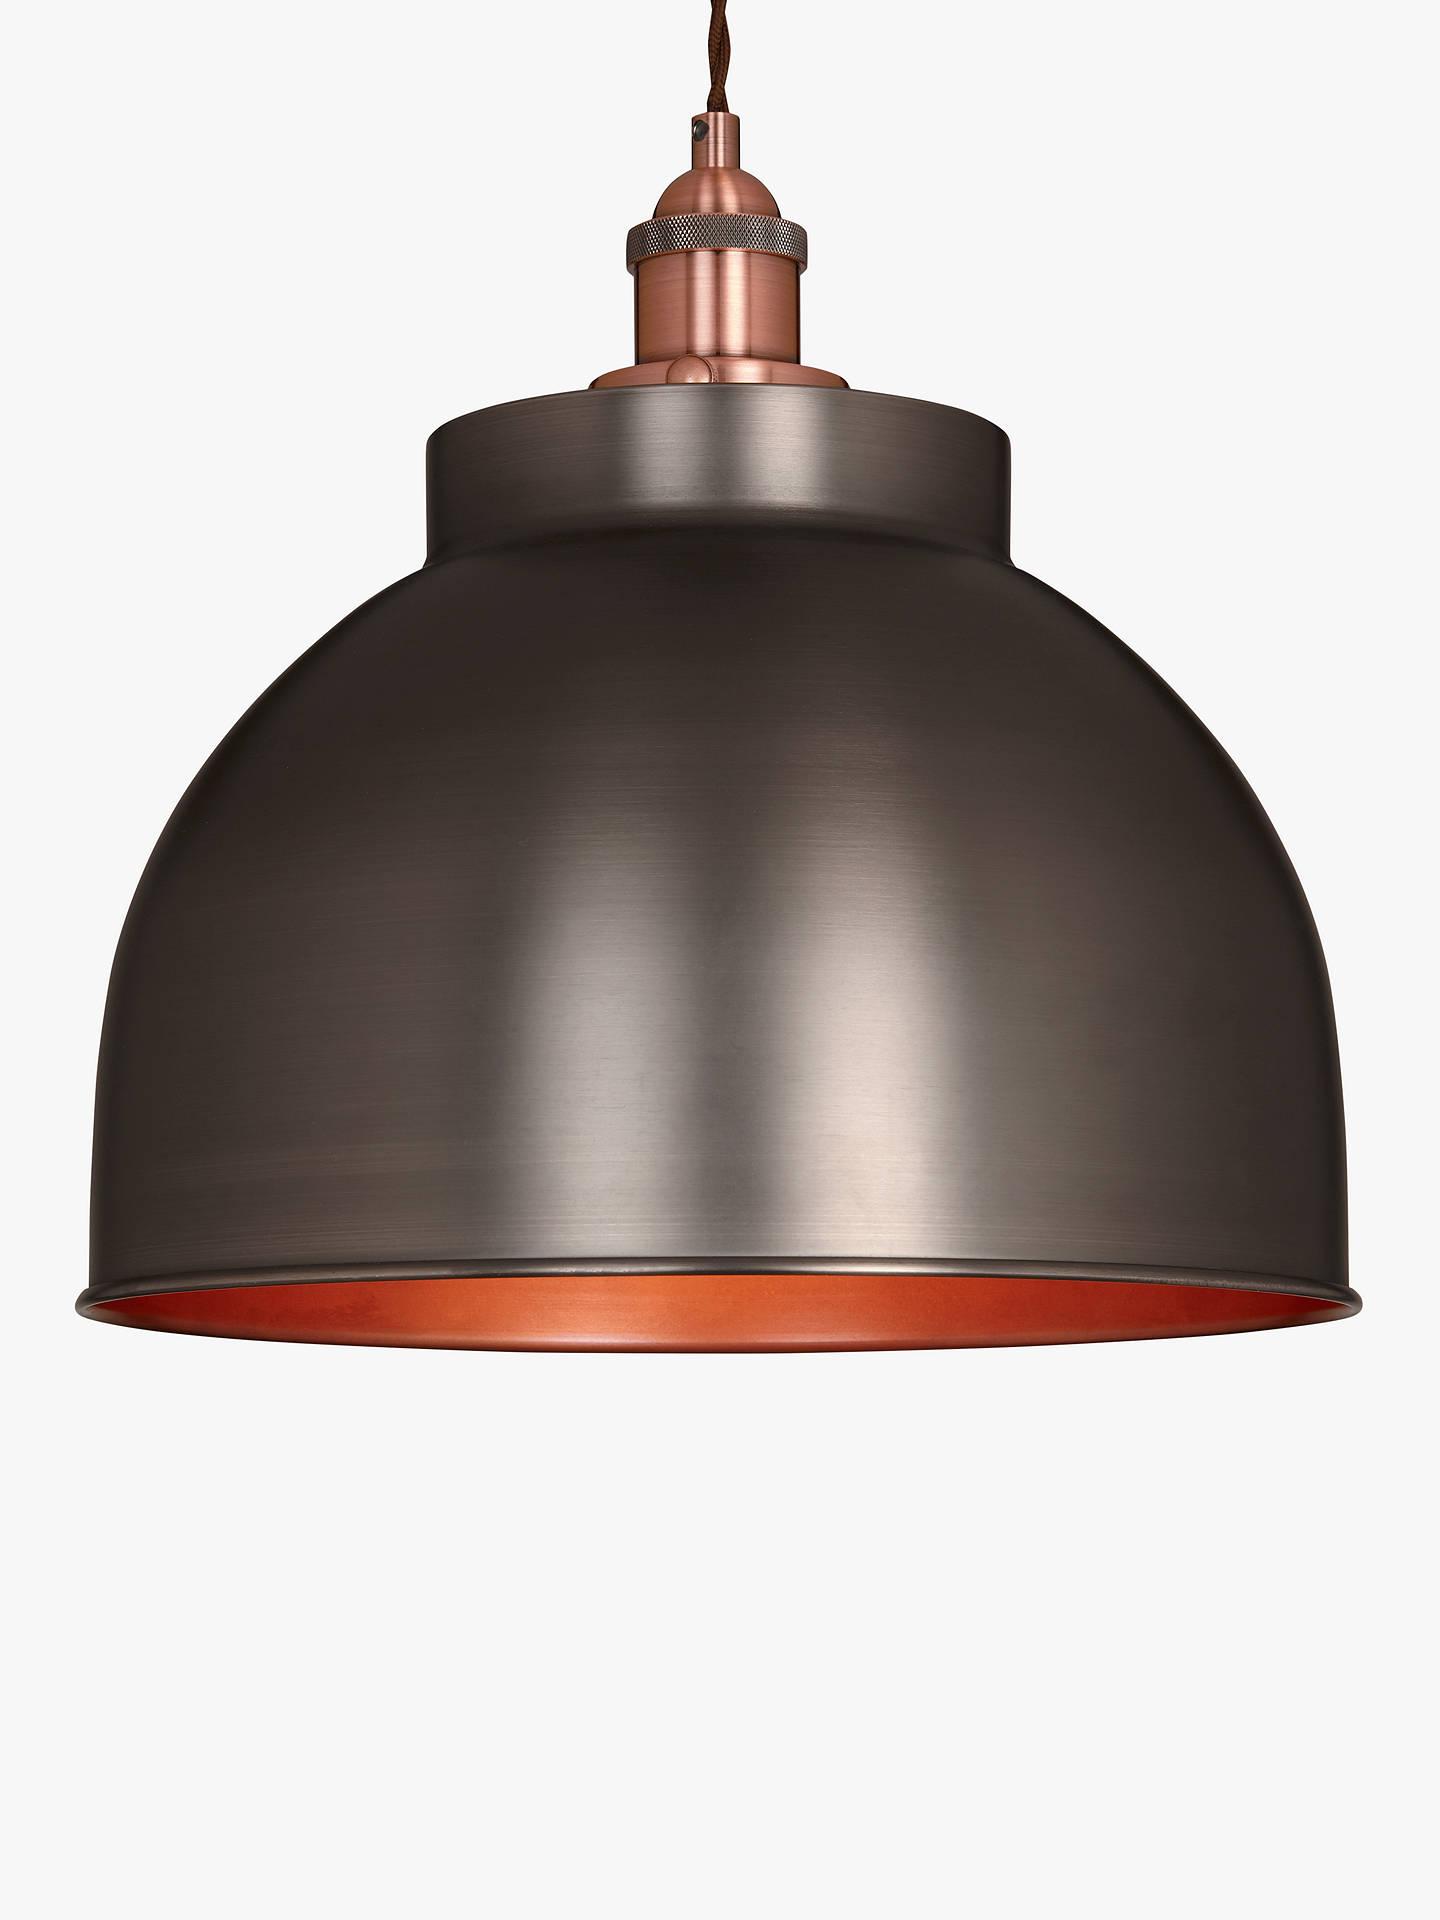 72dab55869d1 Buy John Lewis & Partners Baldwin Large Pendant Ceiling Light,  Pewter/Copper Online at ...